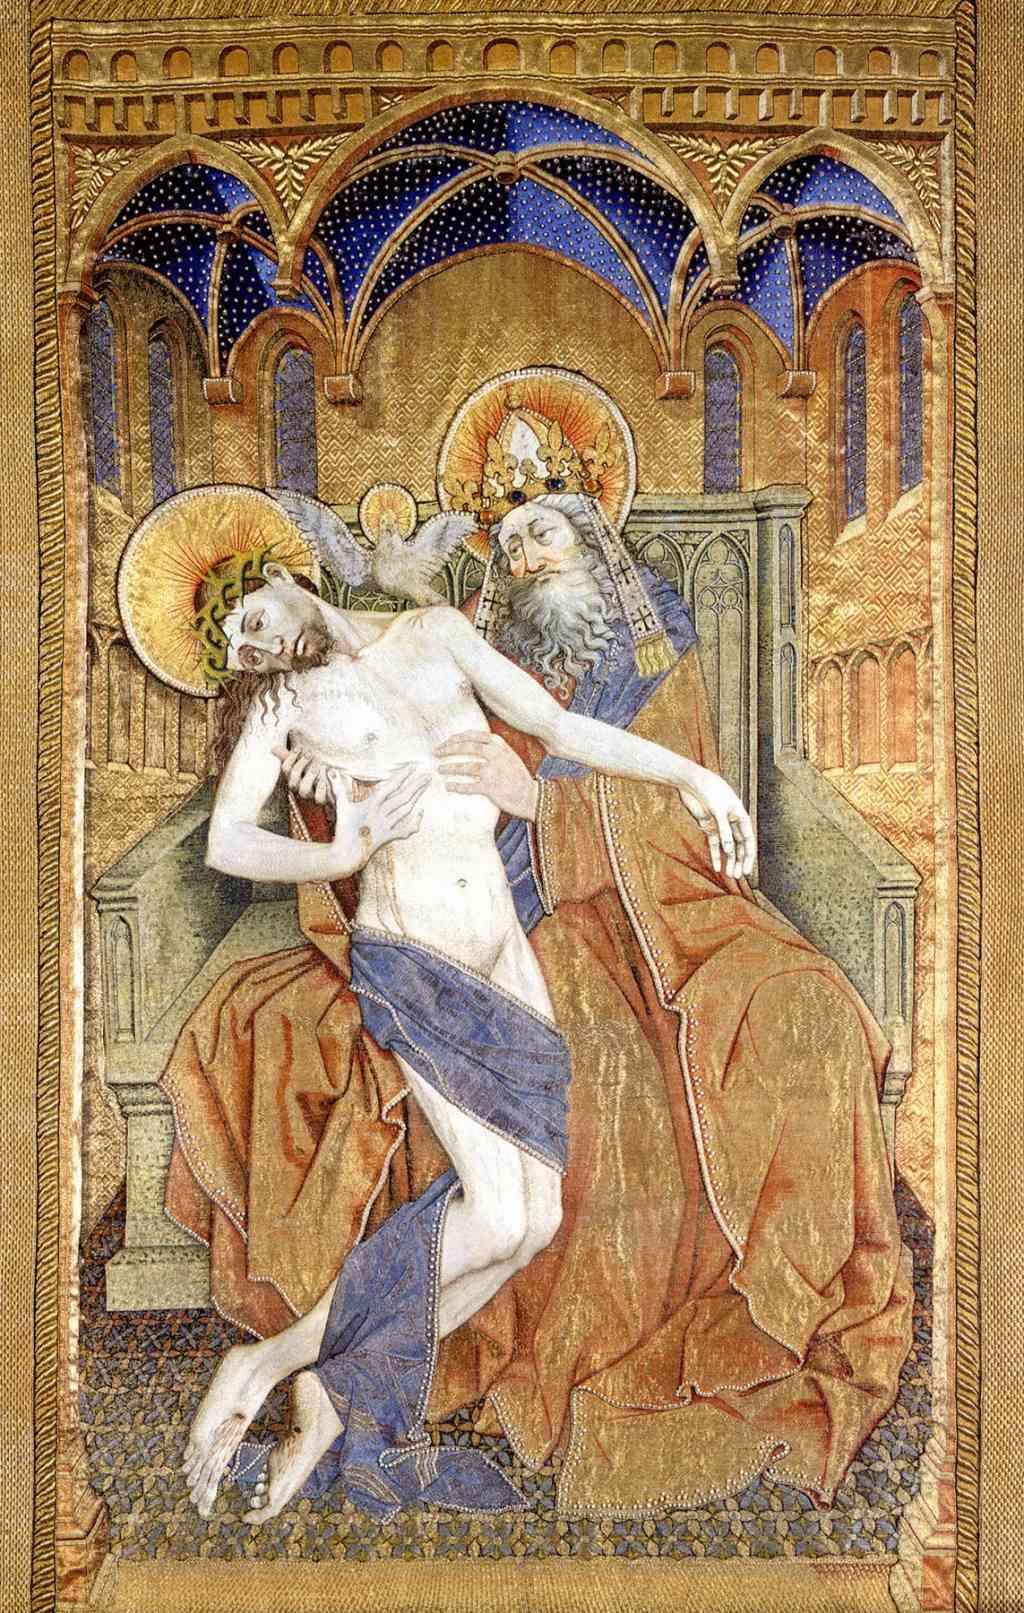 Les peintures religieuses de Robert Campin La_sai11